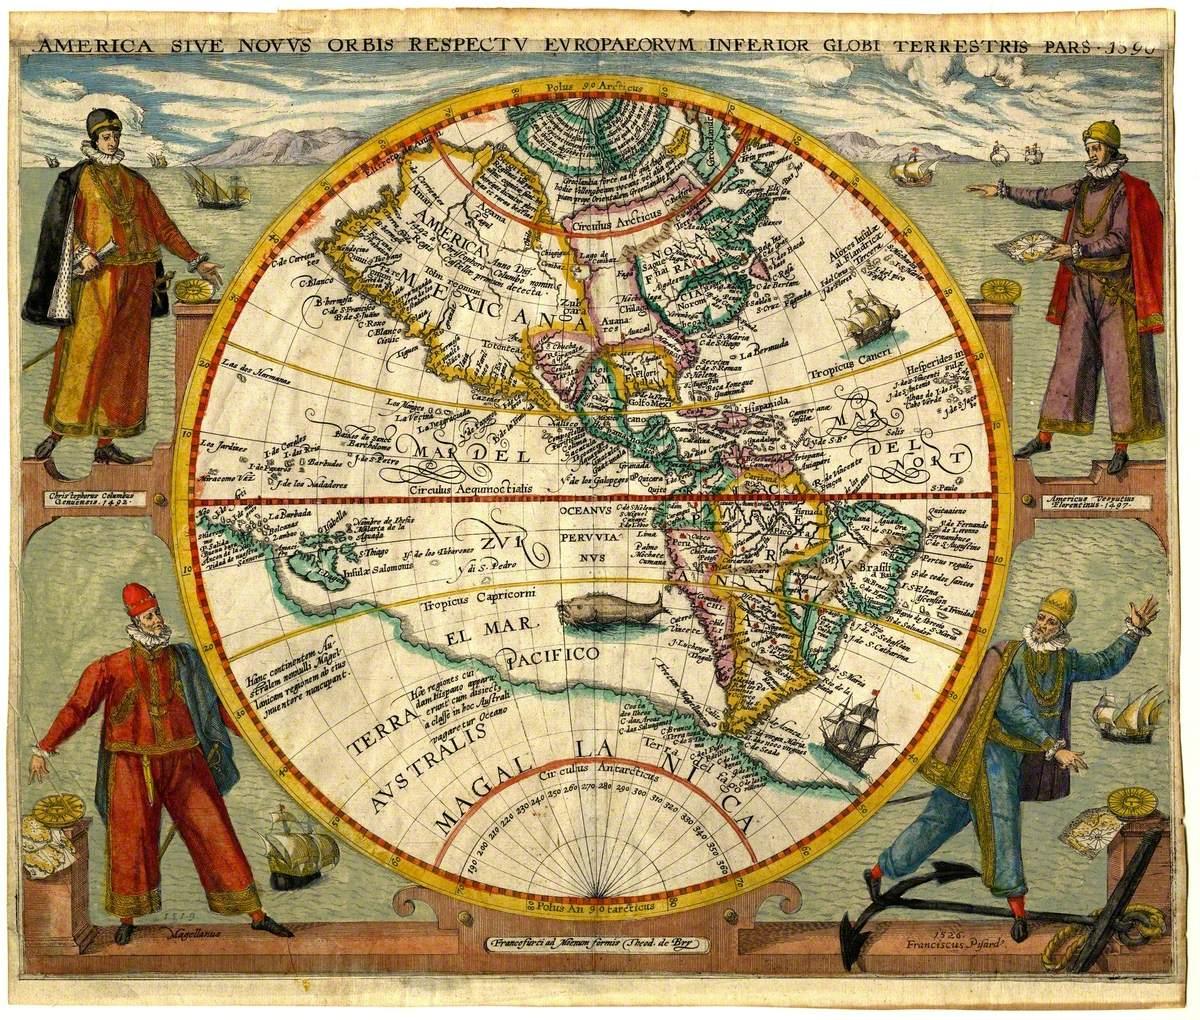 America sive Novus Orbis (America or the New World)